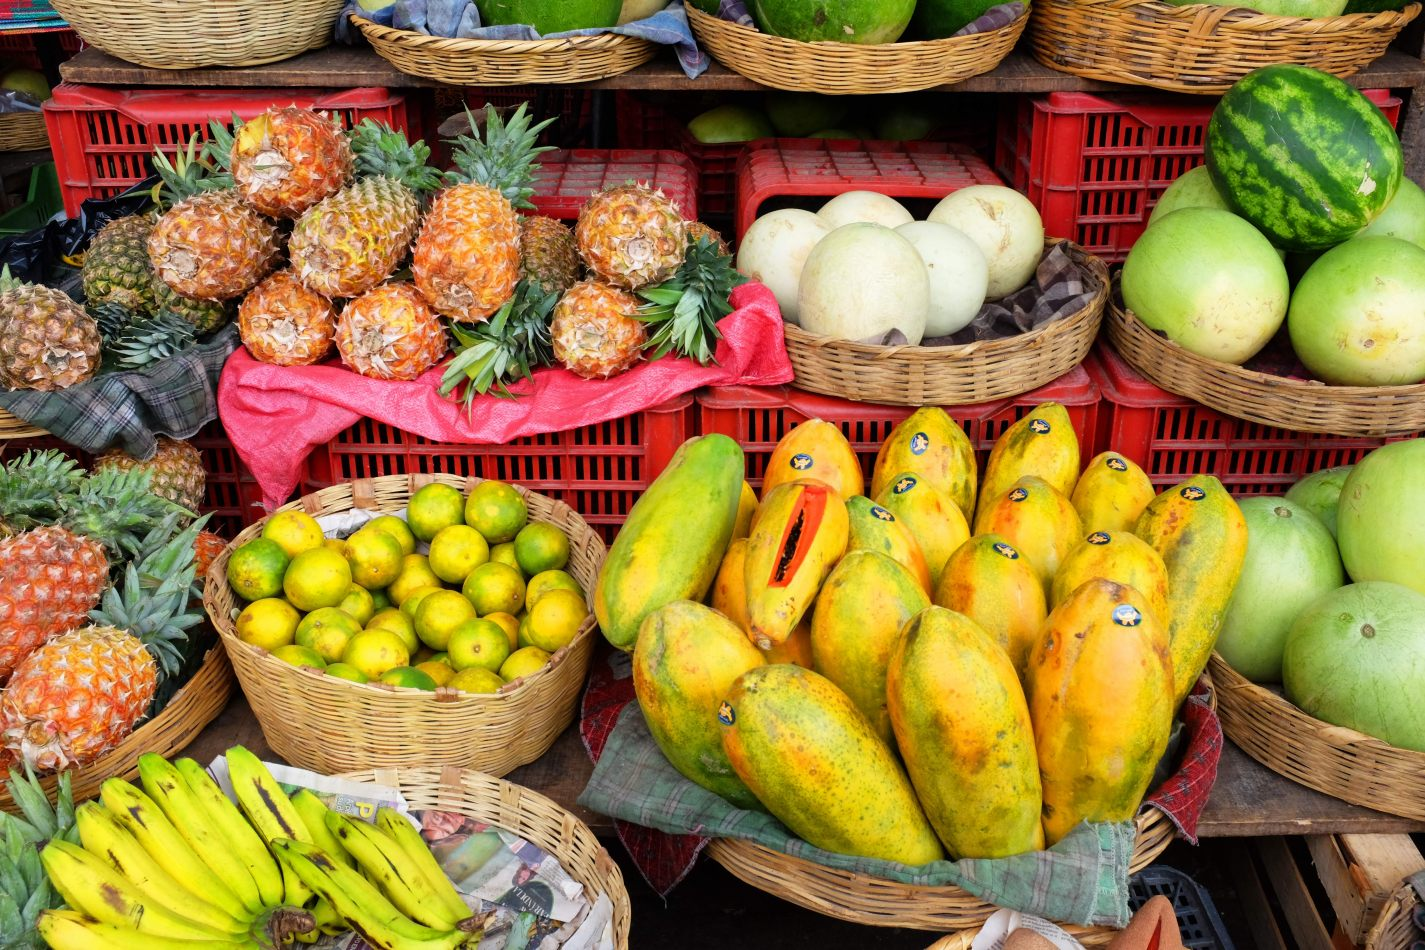 Hibiscus & Nomada : - - Fruits Market